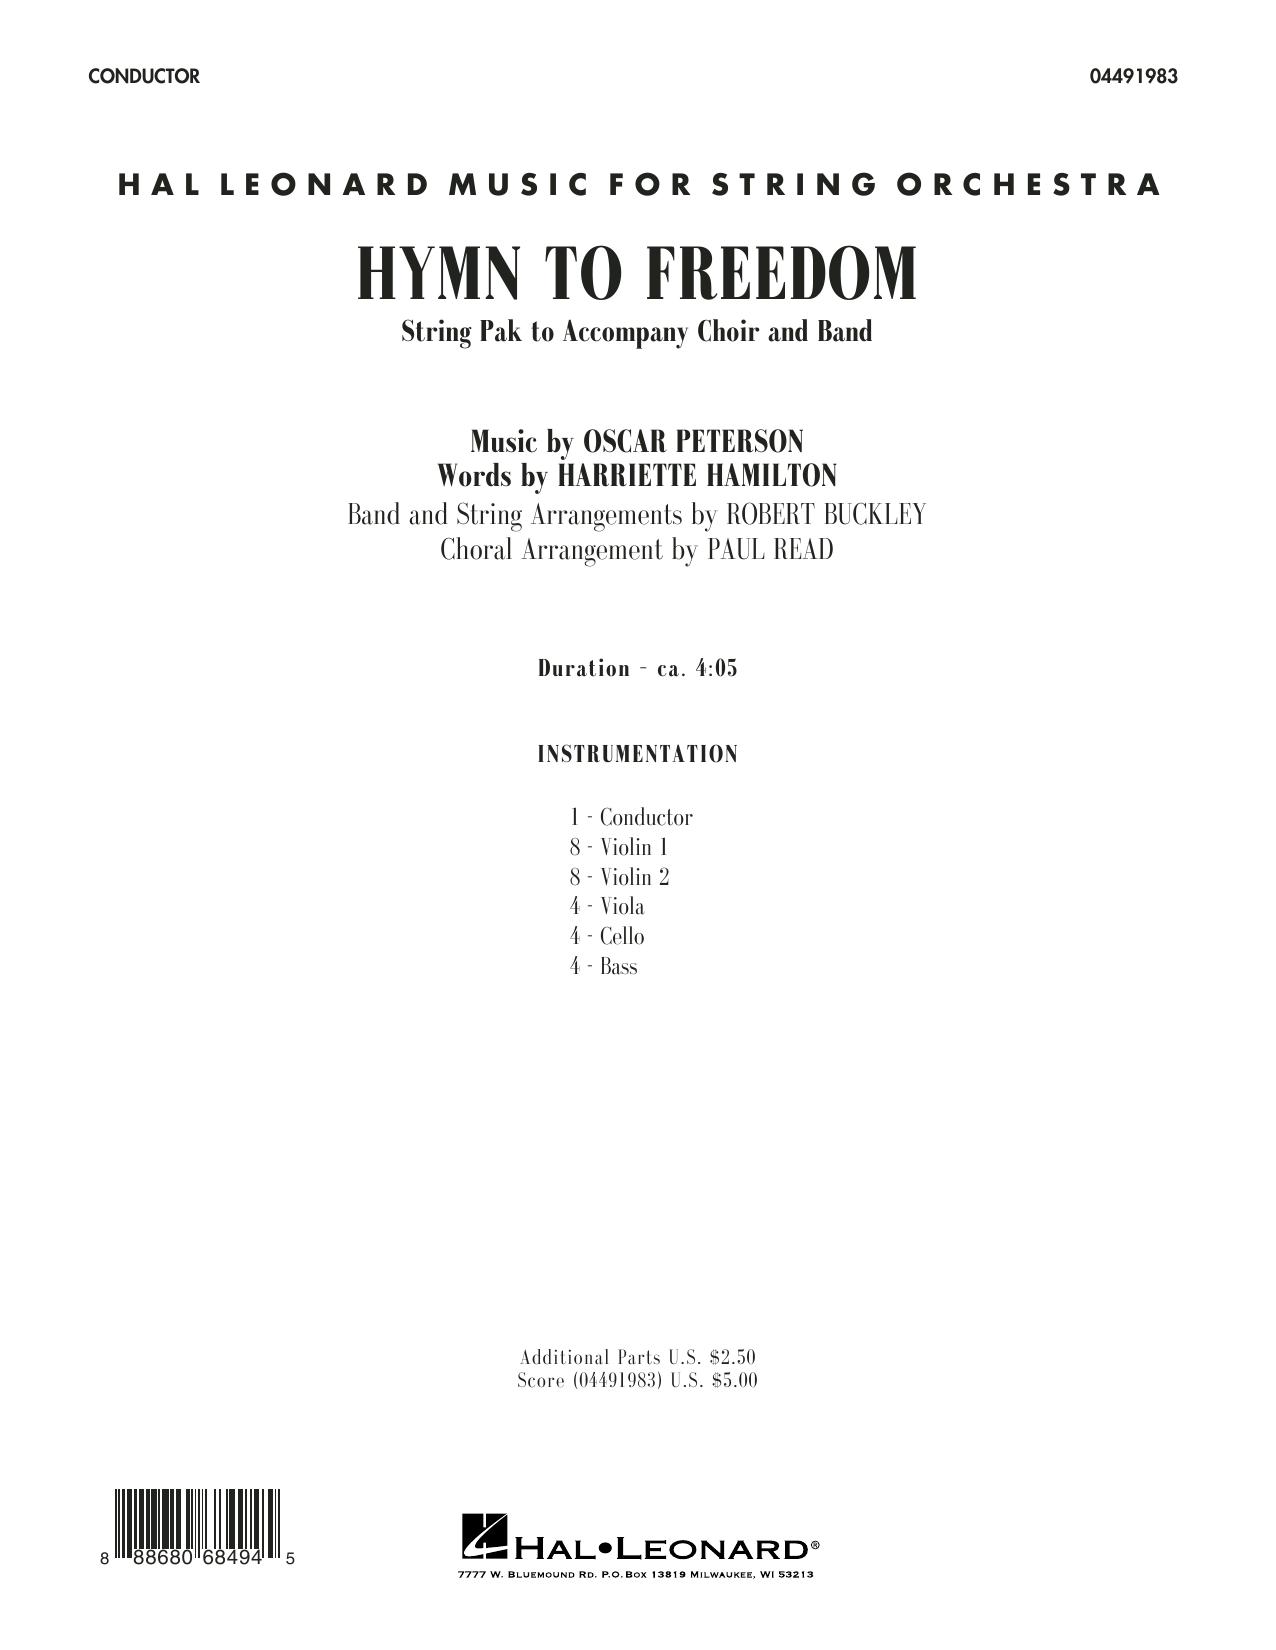 Paul Read - Hymn to Freedom - Conductor Score (Full Score)